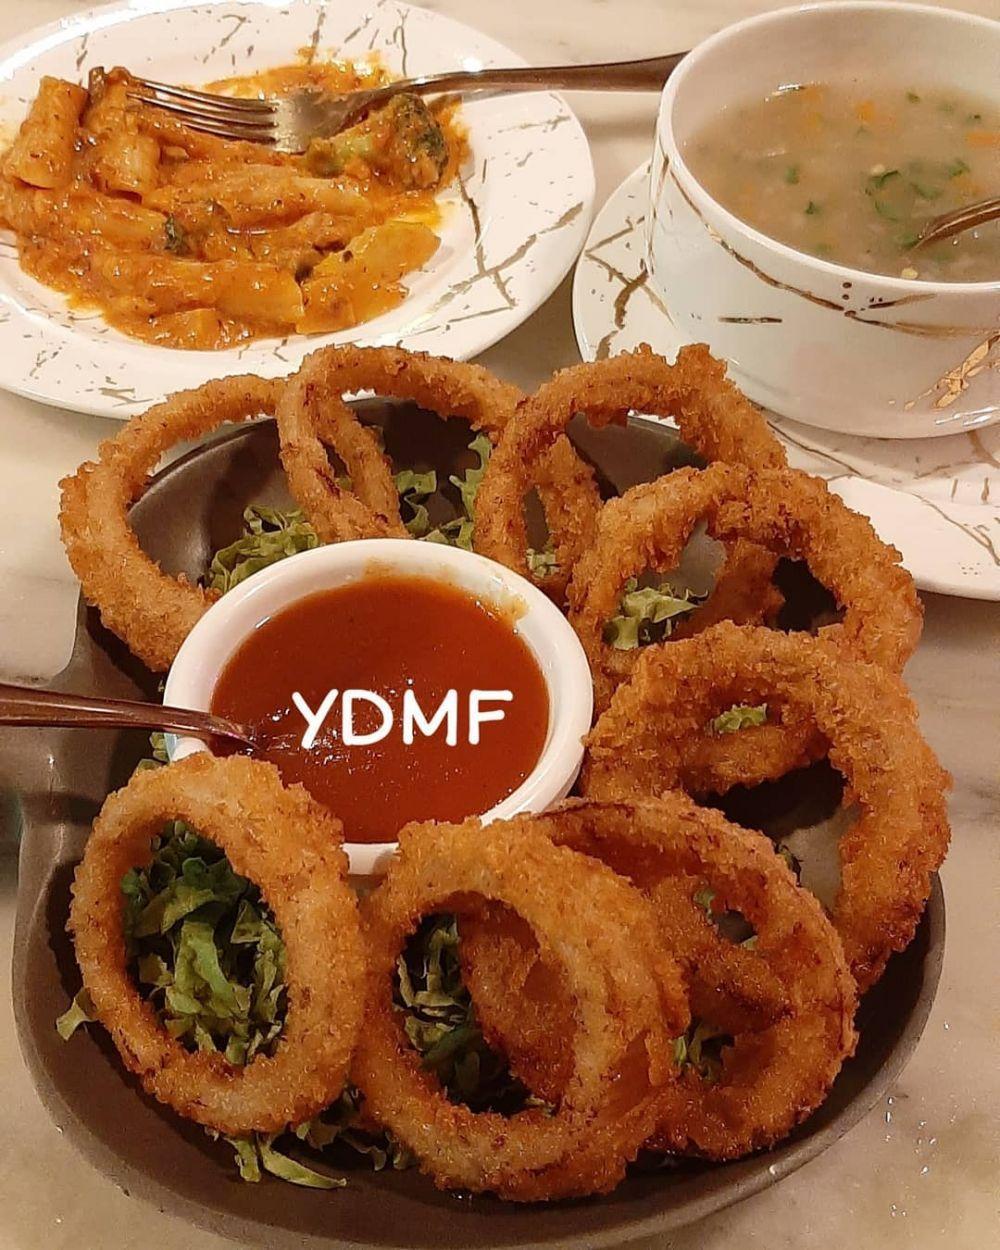 10 Cara Membuat Onion Ring Kekinian Crispy Dan Mudah Instagram Di 2020 Makanan Dan Minuman Makanan Enak Resep Masakan